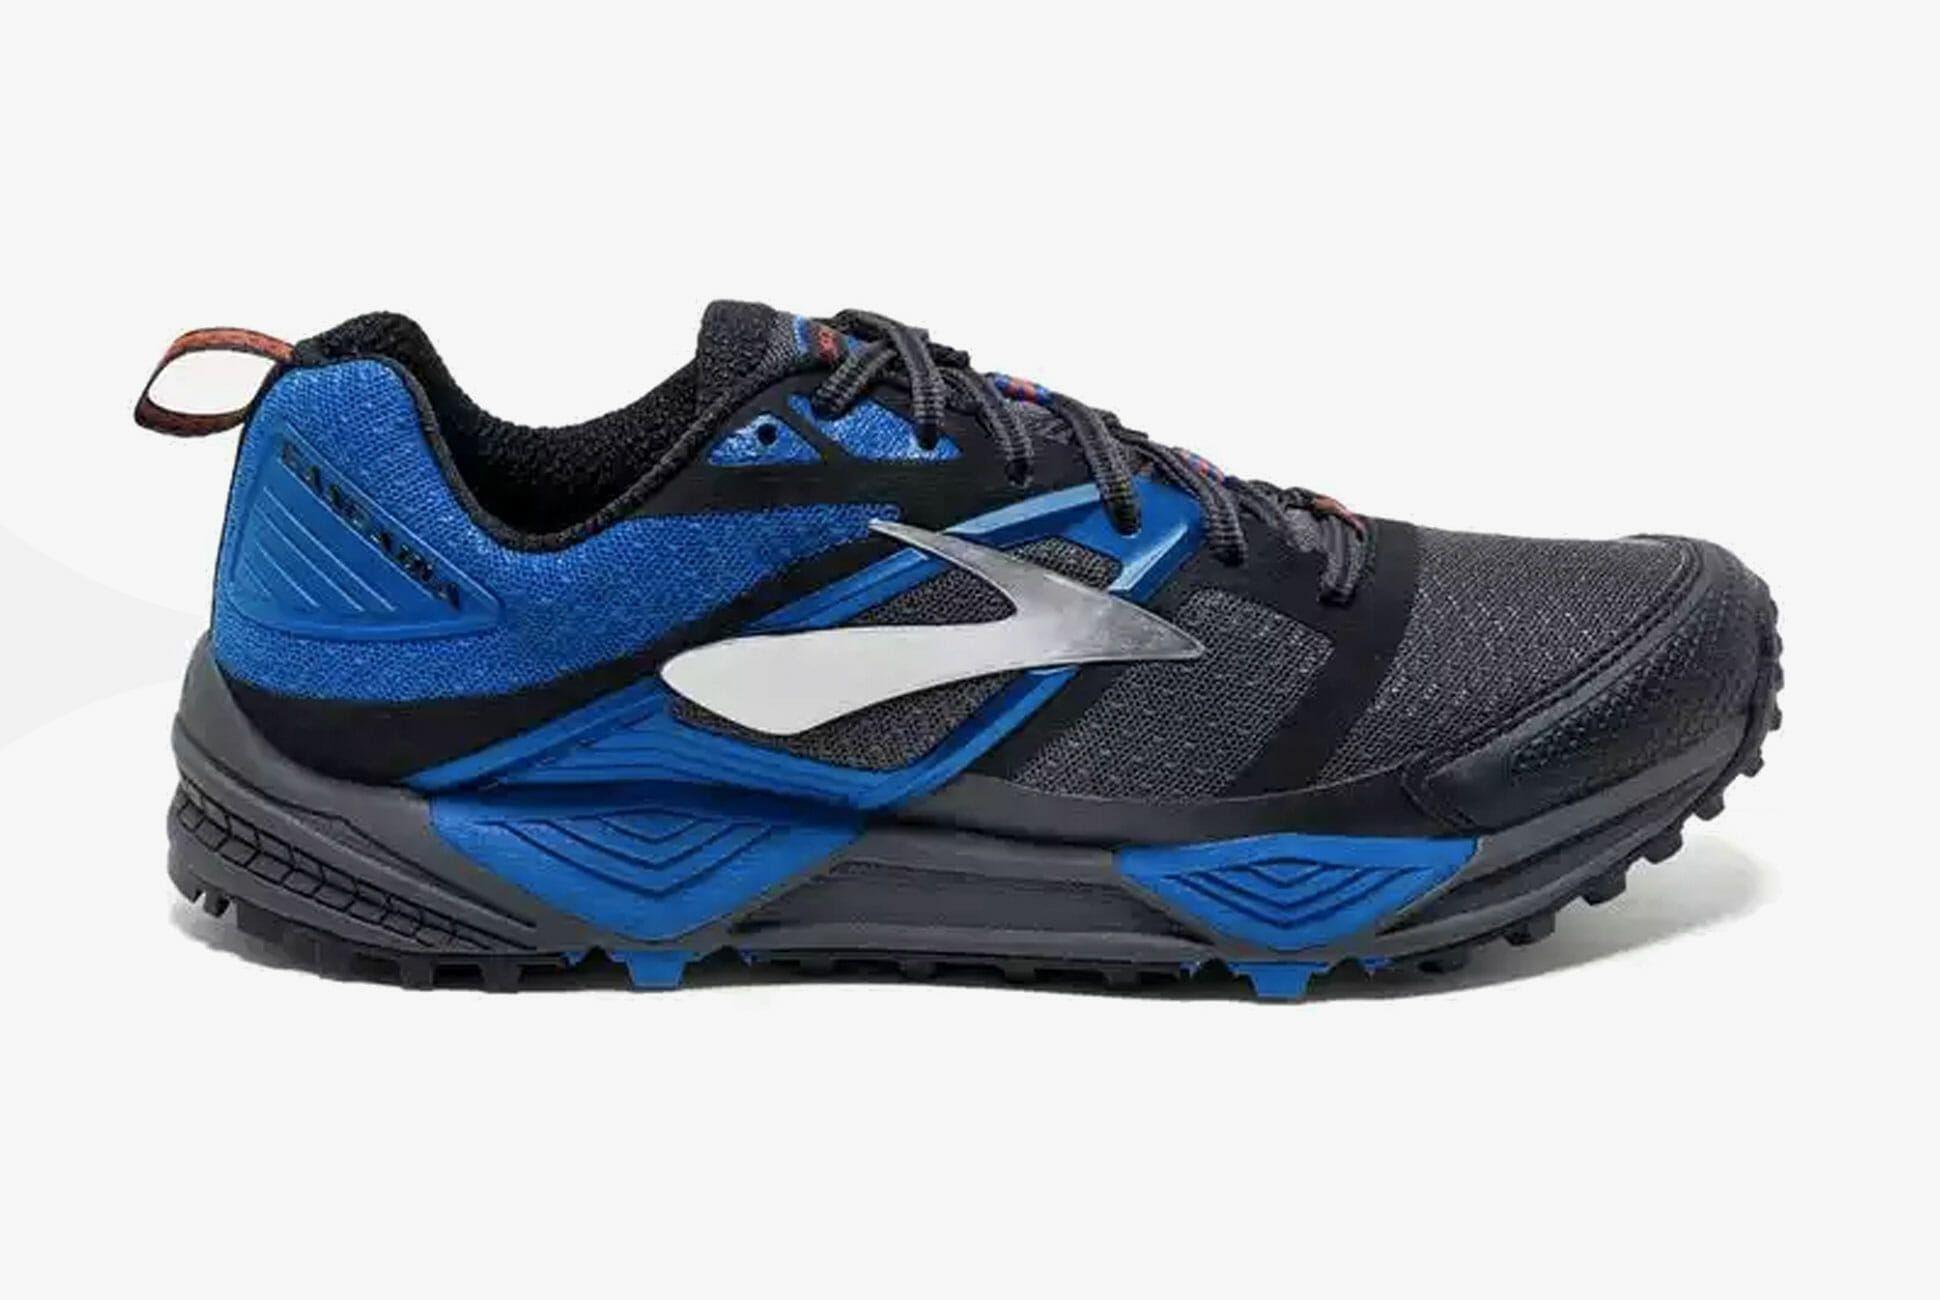 mizuno womens volleyball shoes size 8 queen javascript in zip